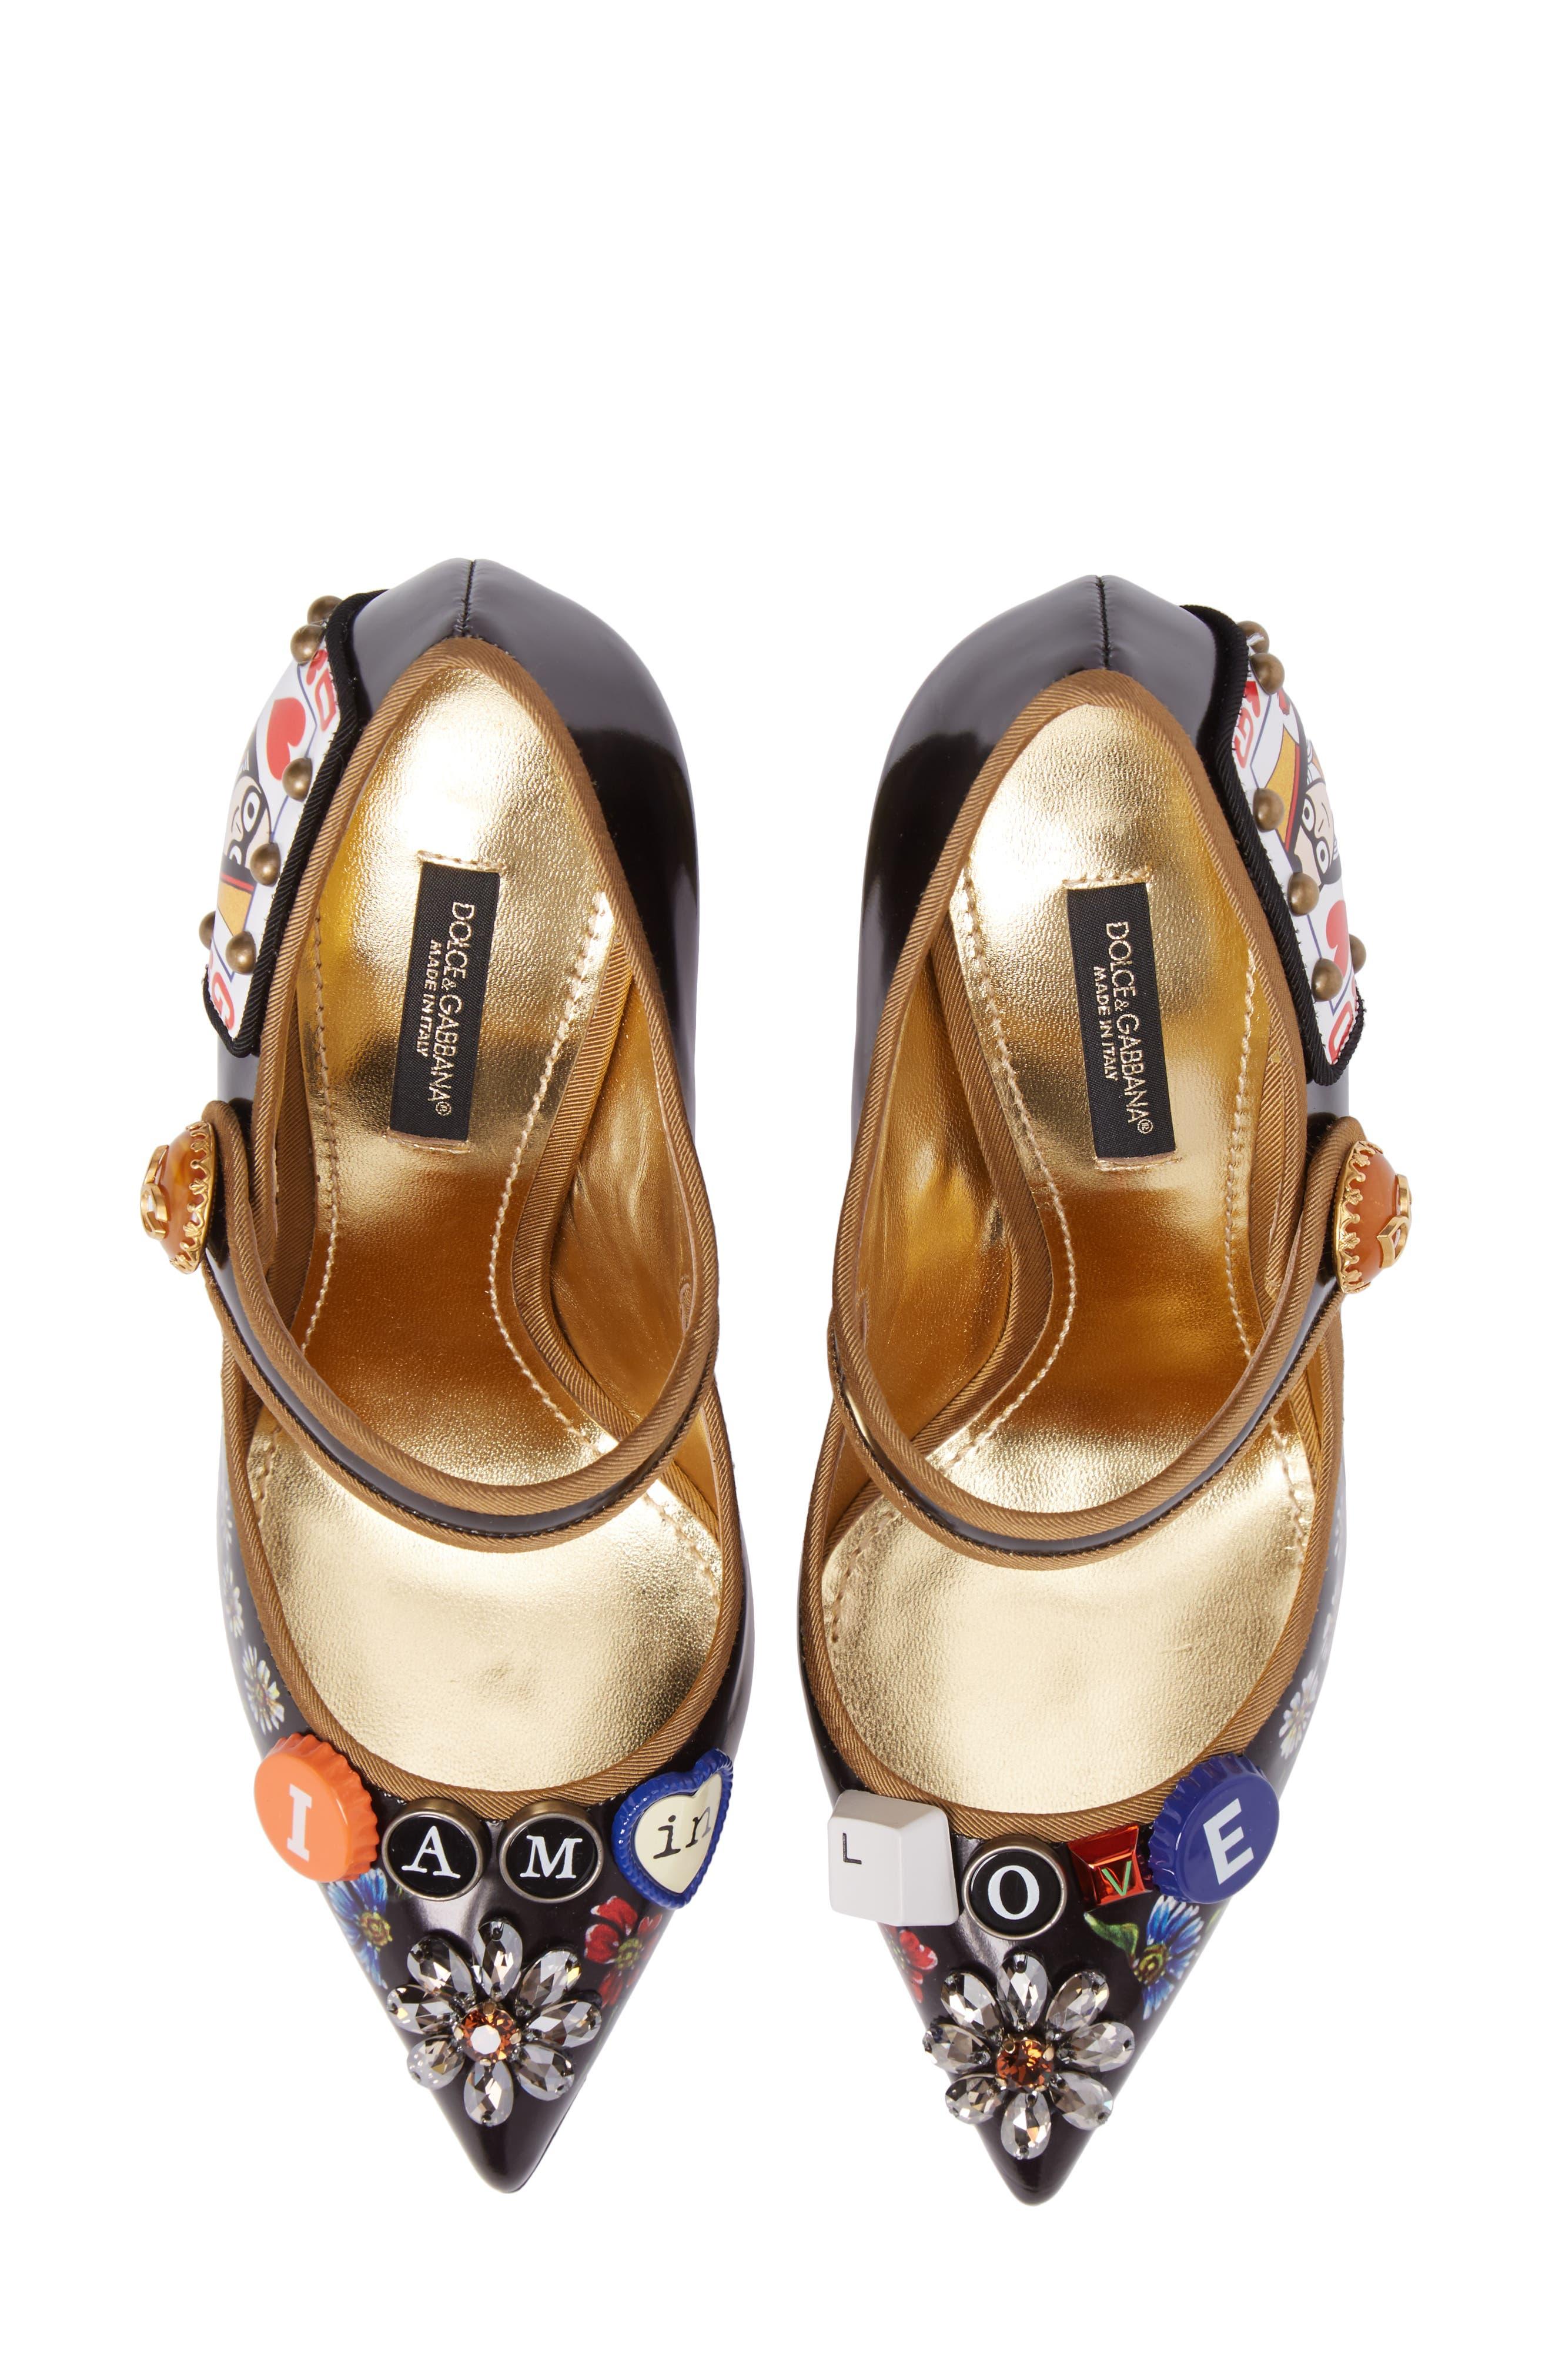 Alternate Image 1 Selected - Dolce&Gabbana Embellished Mary Jane Pump (Women)